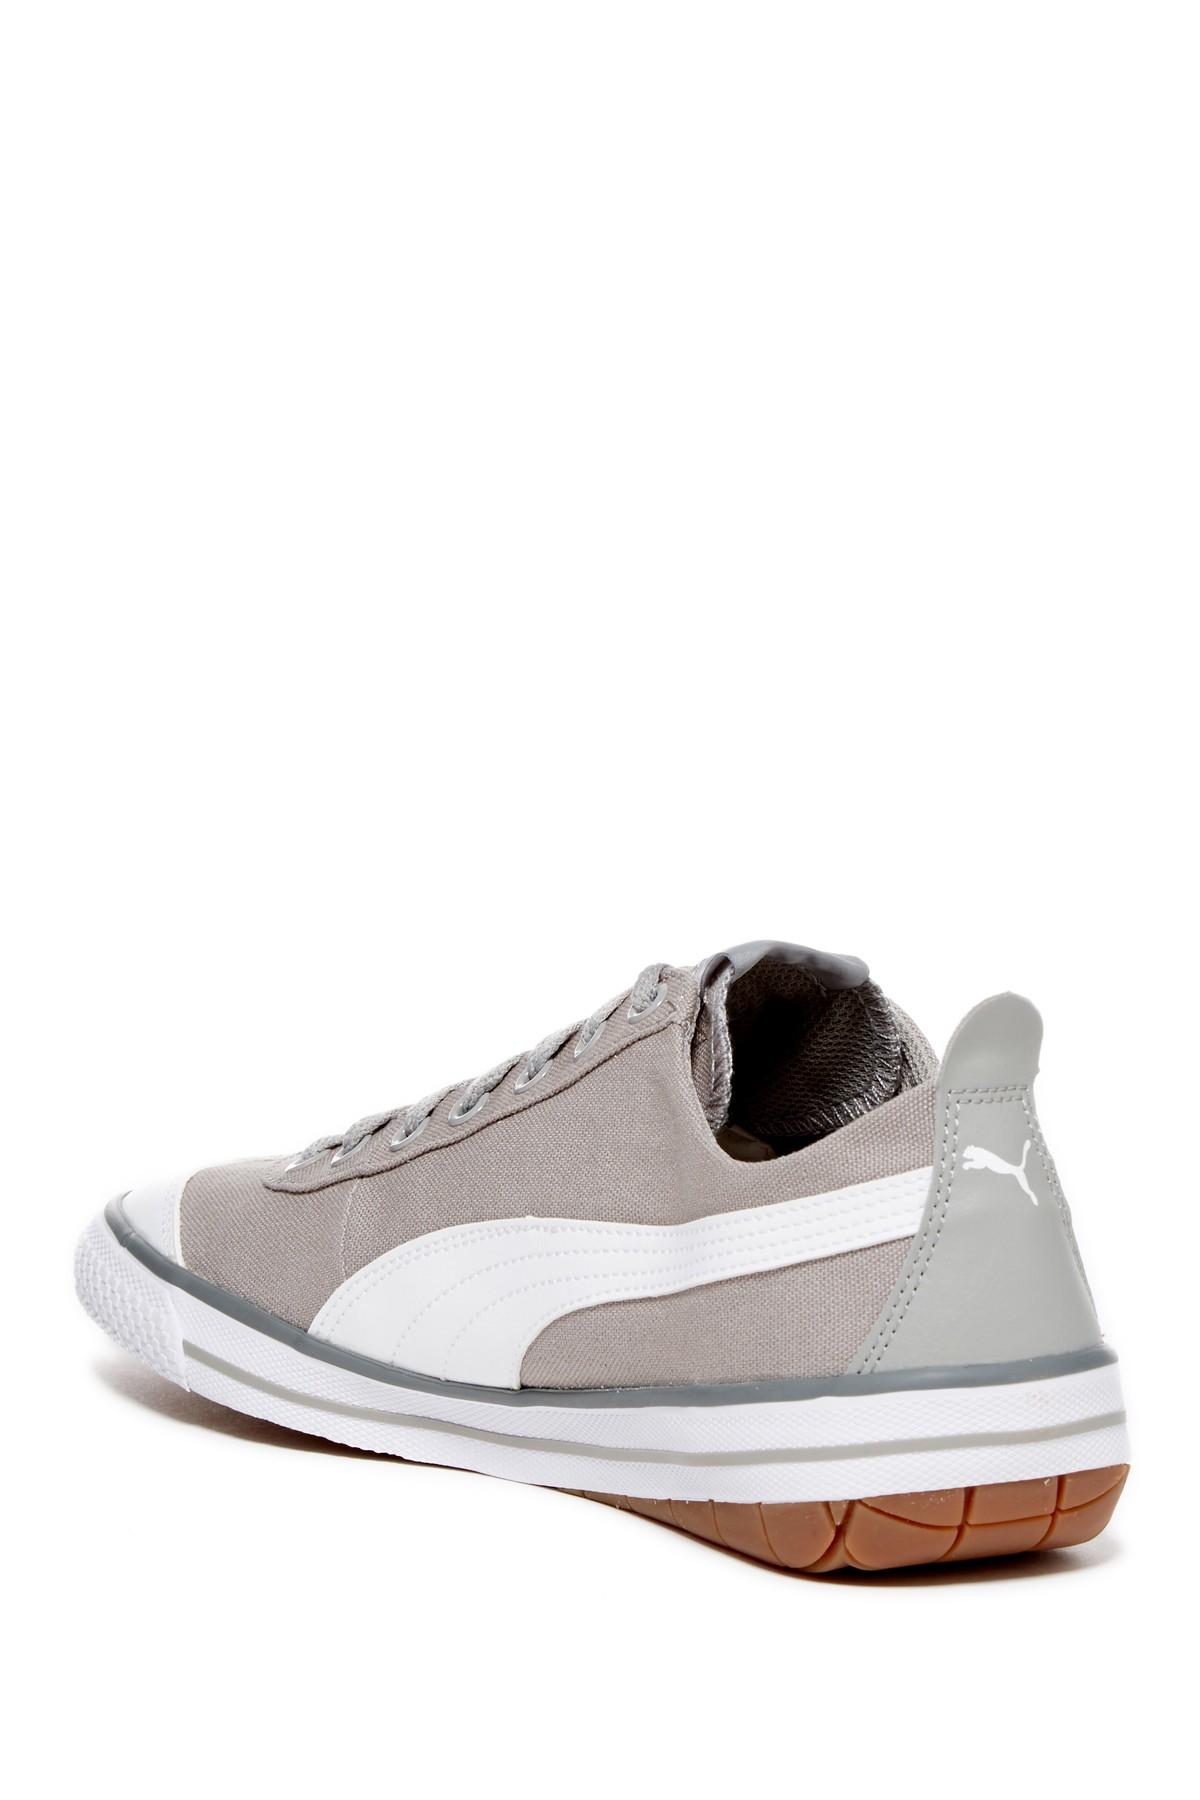 Lyst Puma 917 Fun Canvas Sneaker In White For Men